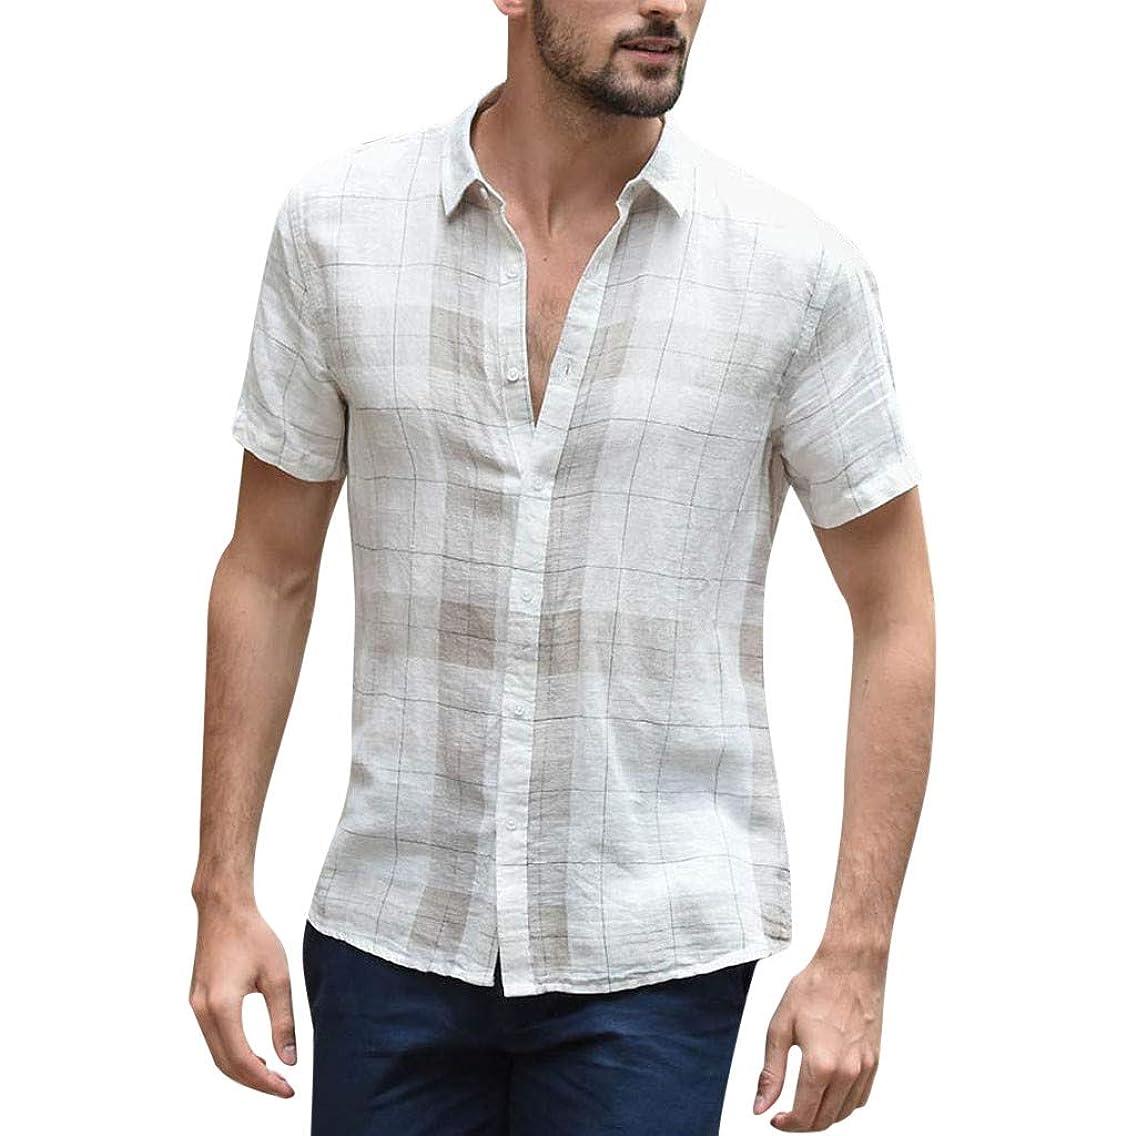 Mens Summer t Shirts Short Sleeve Tronet Men's Baggy Cotton Linen Plaid Short Sleeve Button Retro Turn-Down Collar Shirts